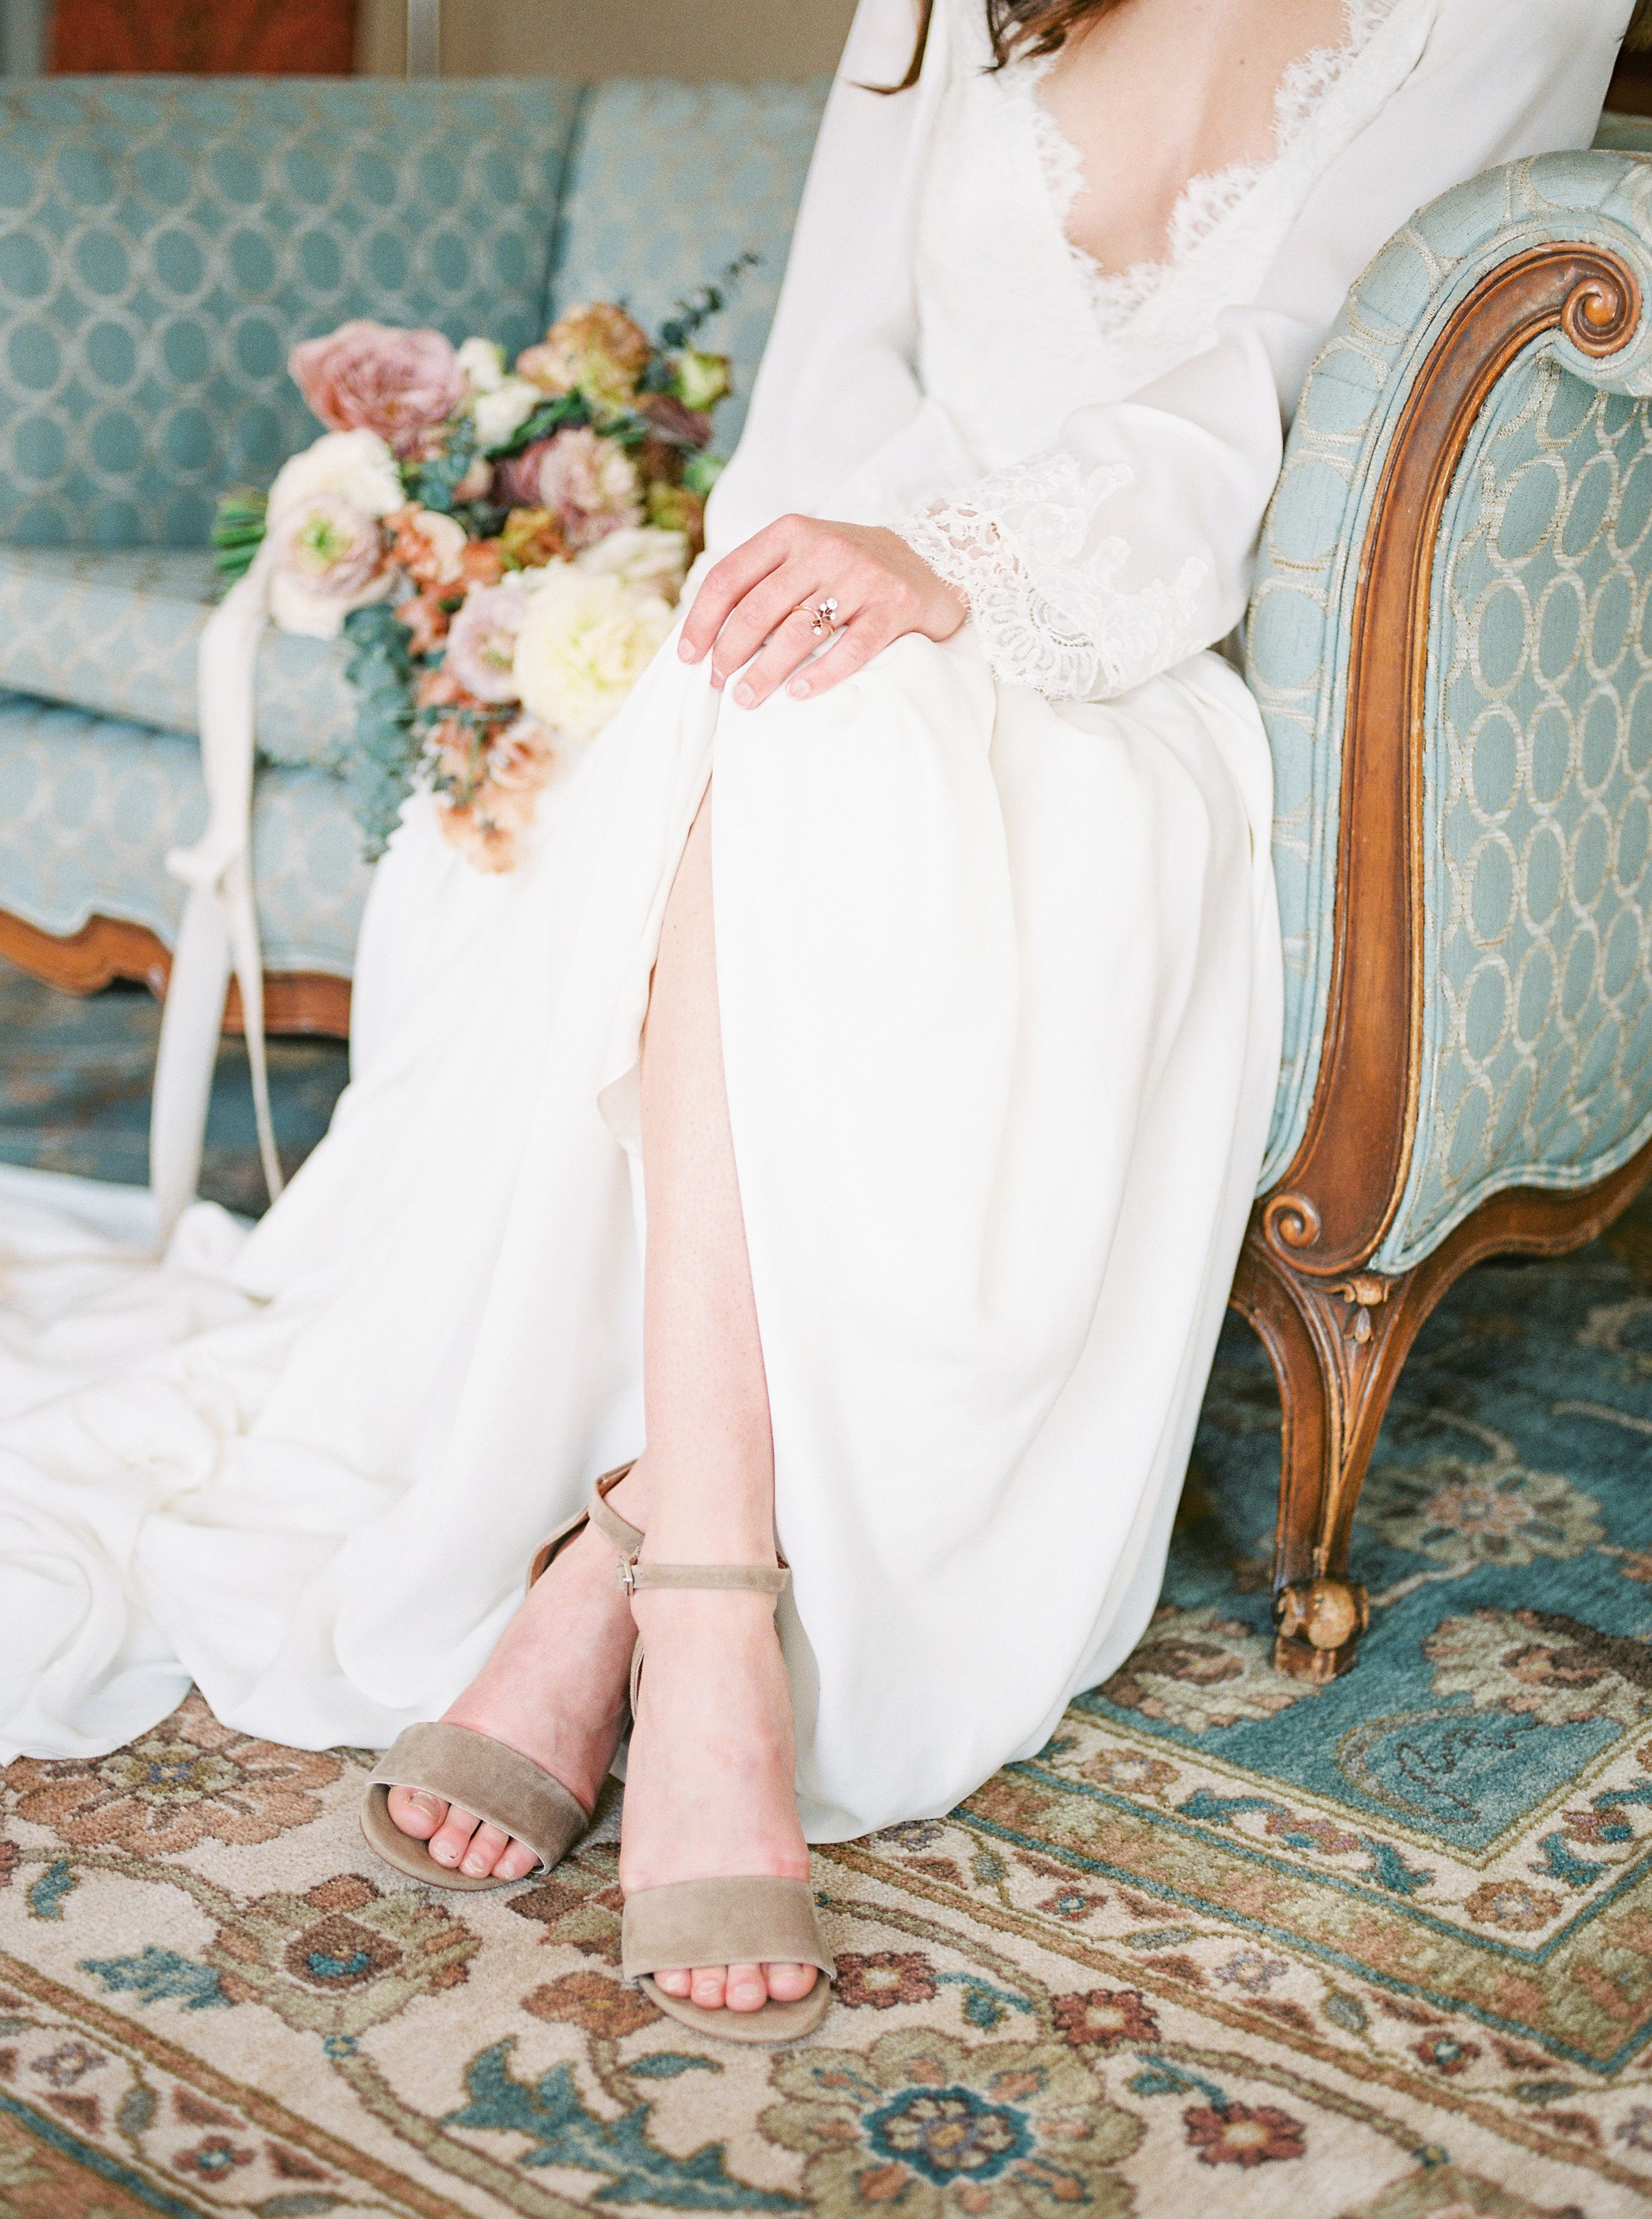 Leanne Marshall Wedding Gown From Denver Bridal Shop Emma Grace